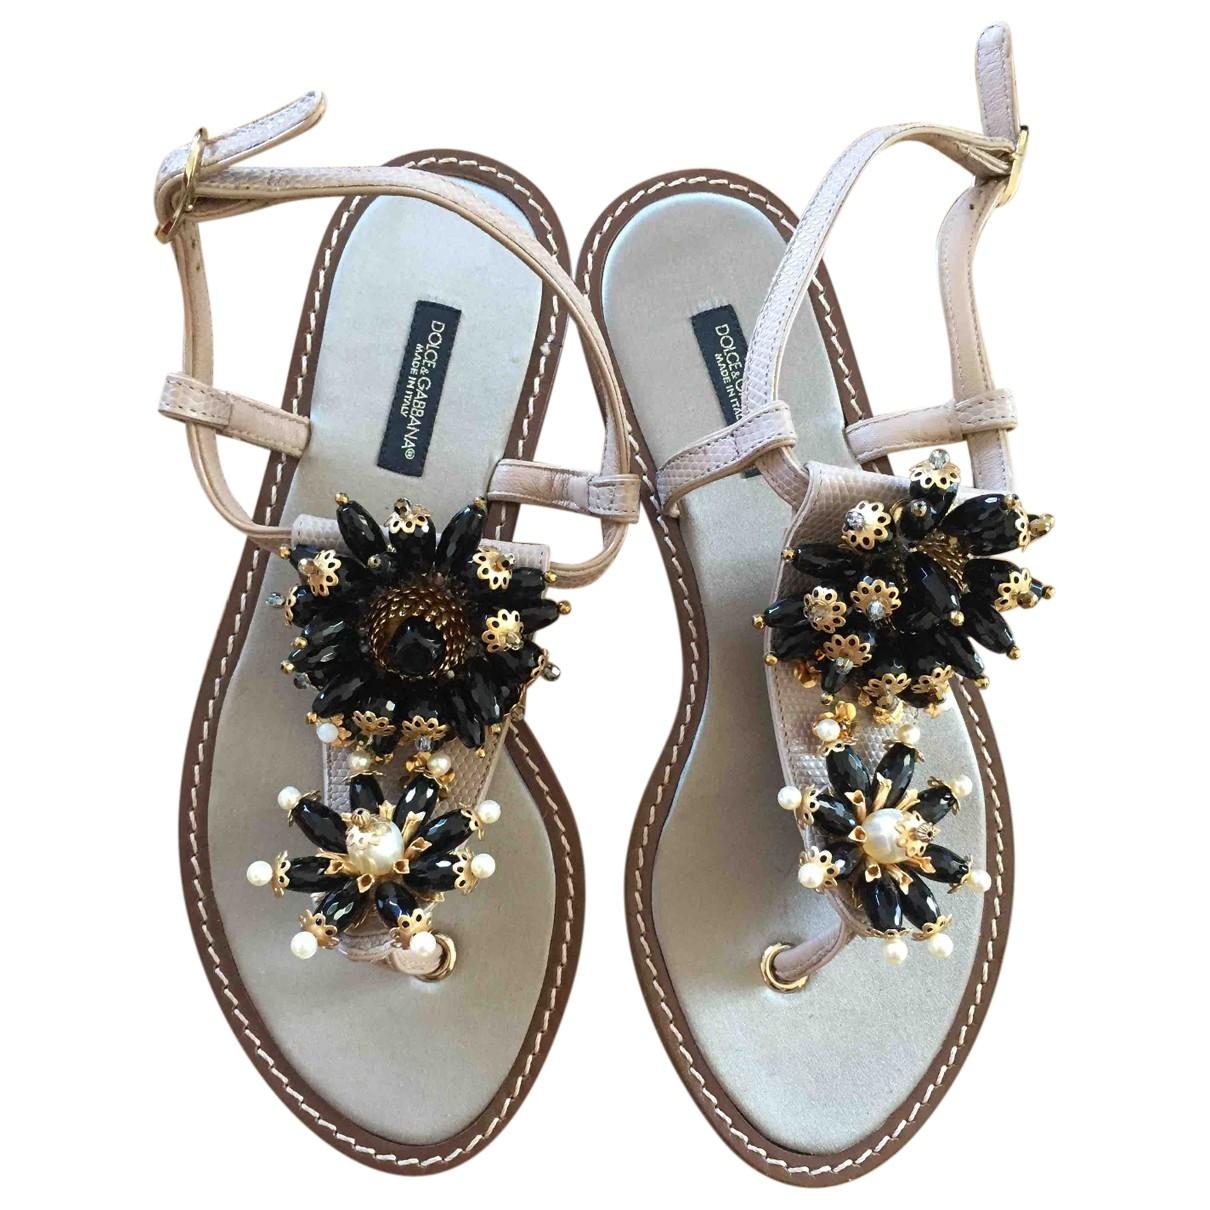 Dolce & Gabbana \N Beige Leather Sandals for Women 36 EU